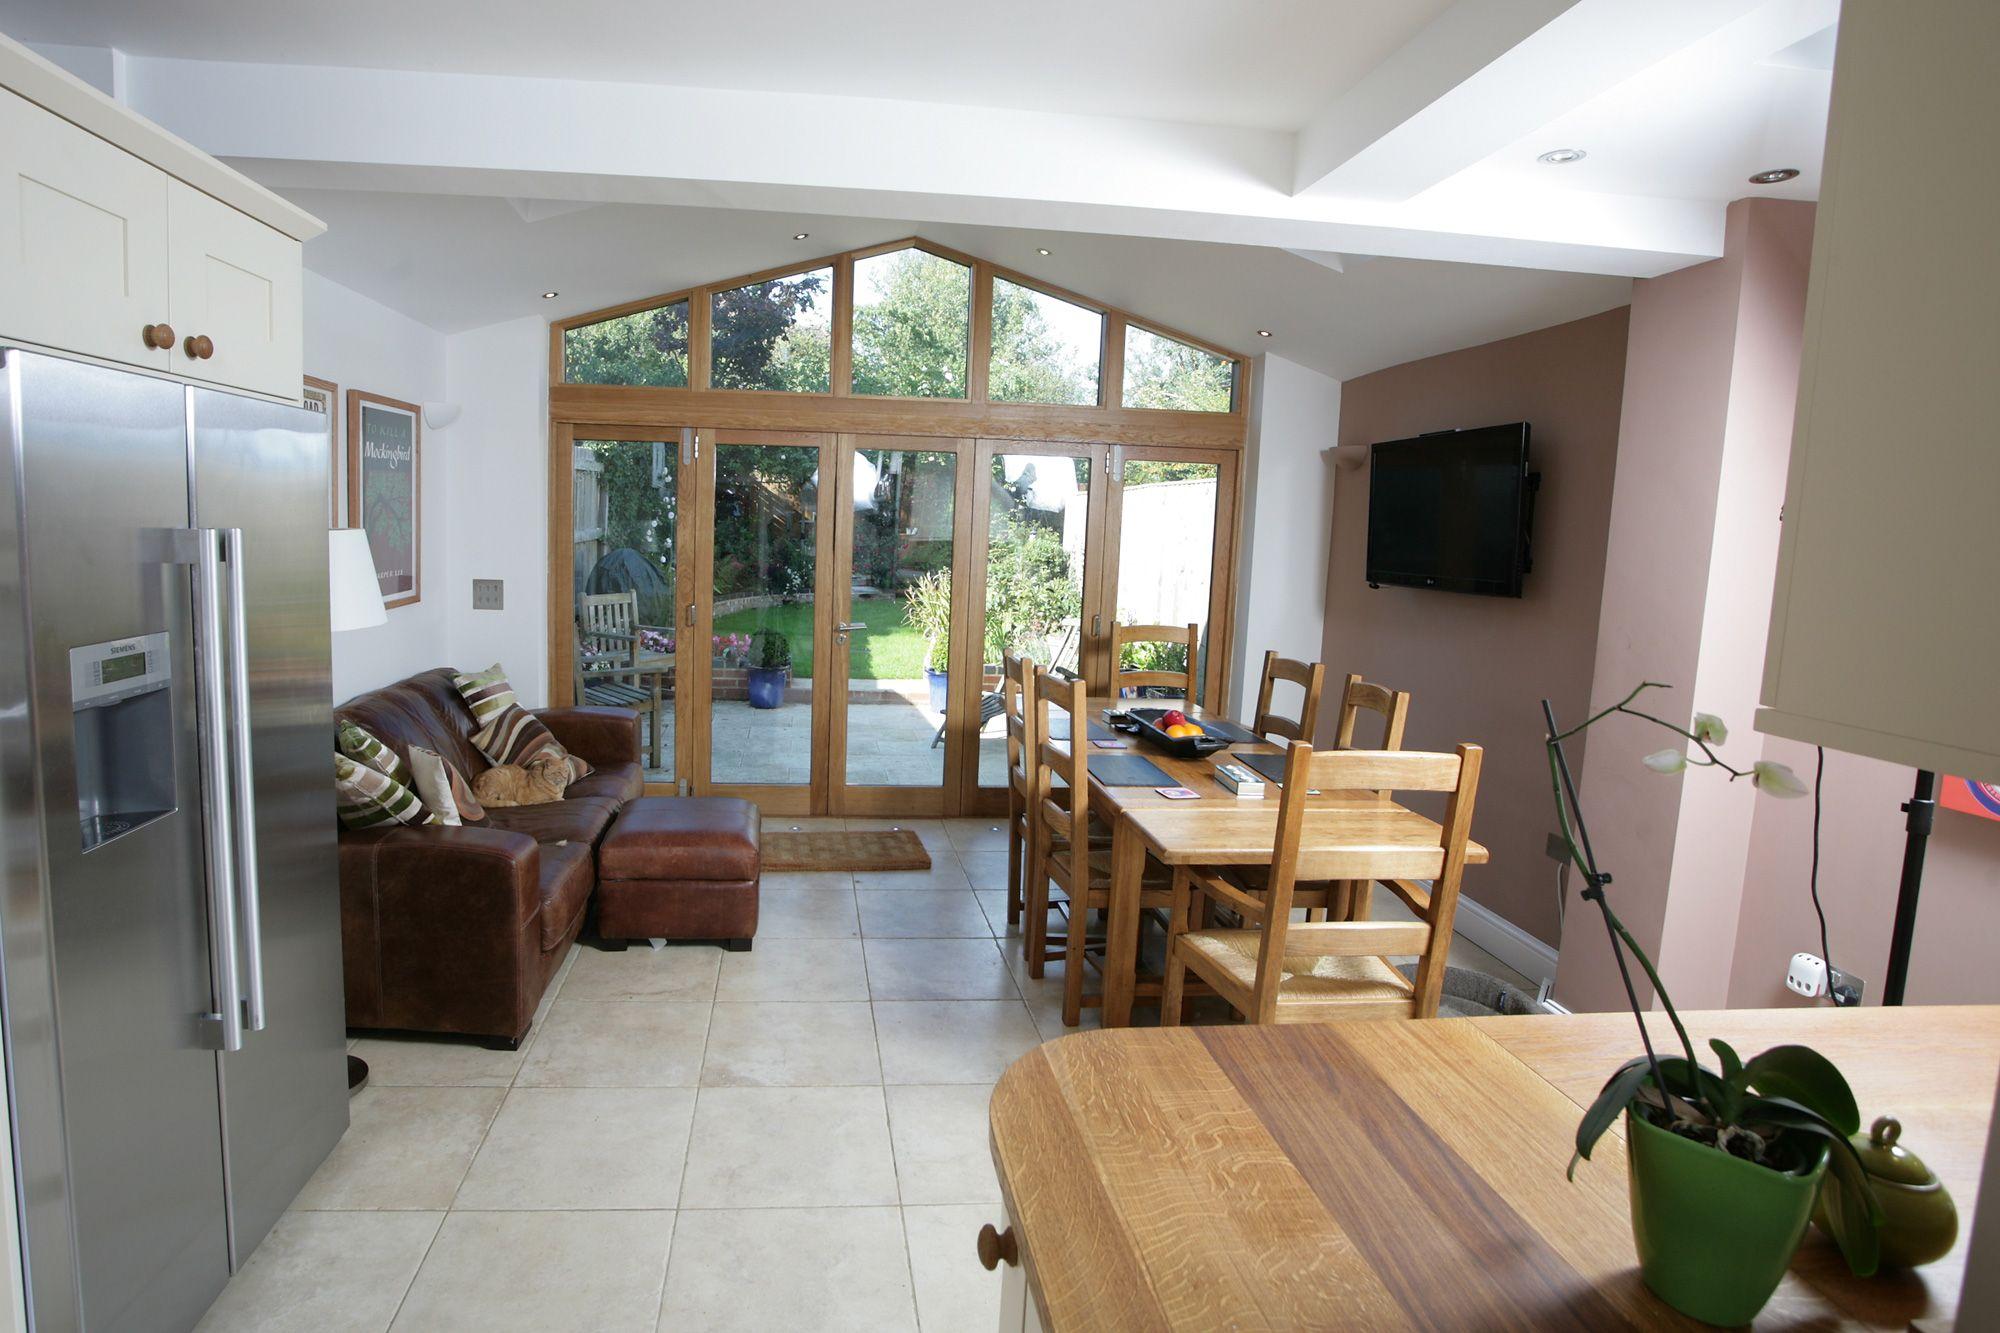 Small Living Room Idea Uk Track Lighting Kitchen Ideas Minimalist House Design Inspiration